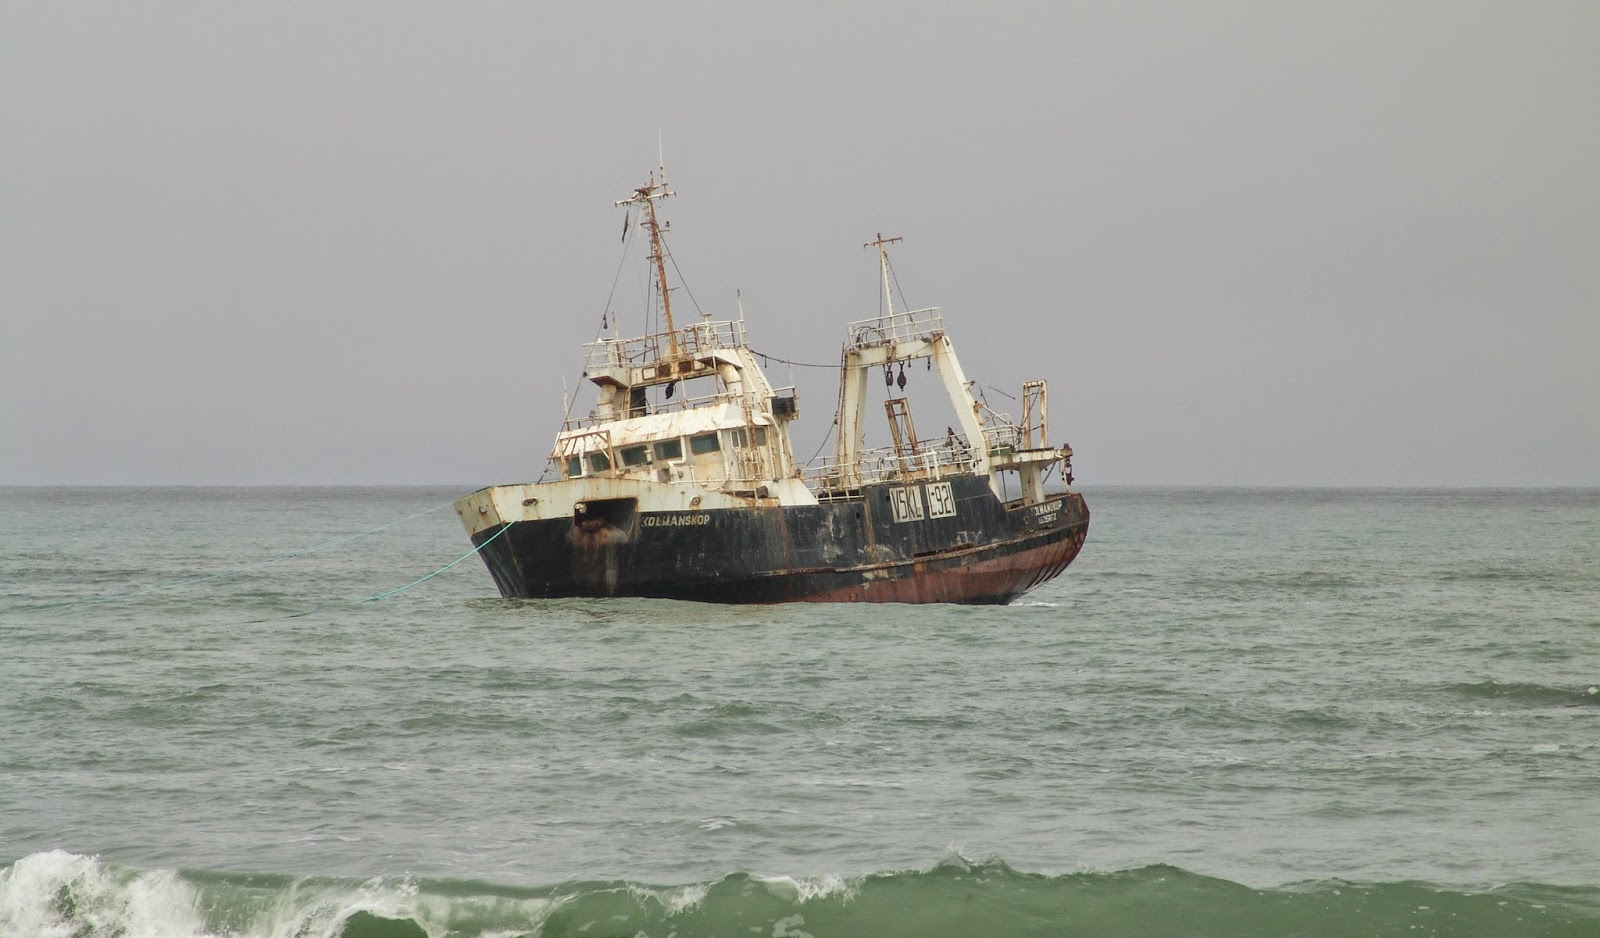 Ship wreck near Swakopmund, Namibia